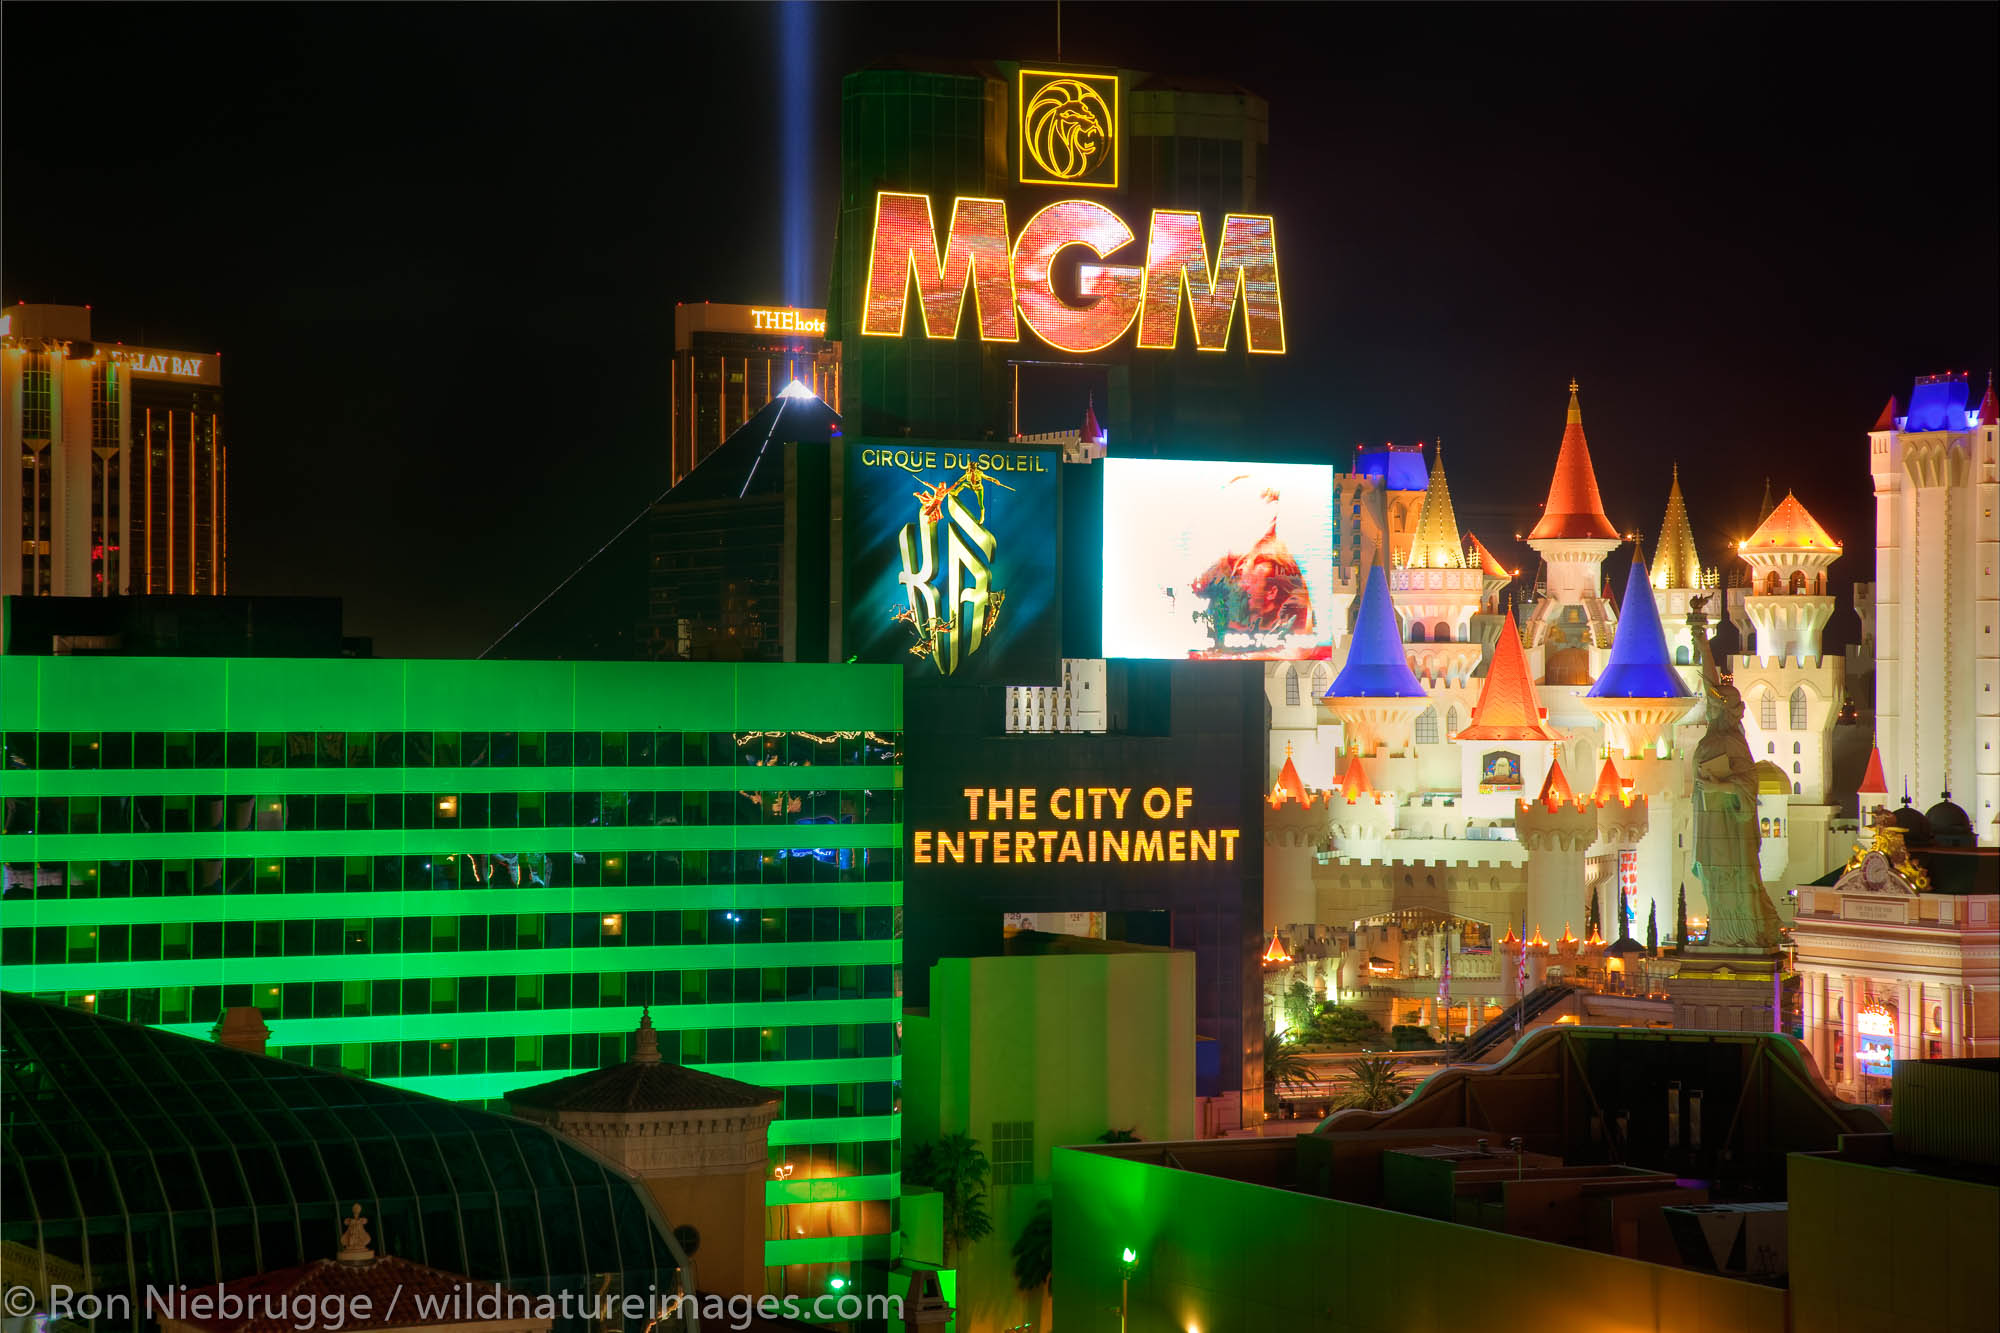 MGM Grand, Las Vegas, Nevada.